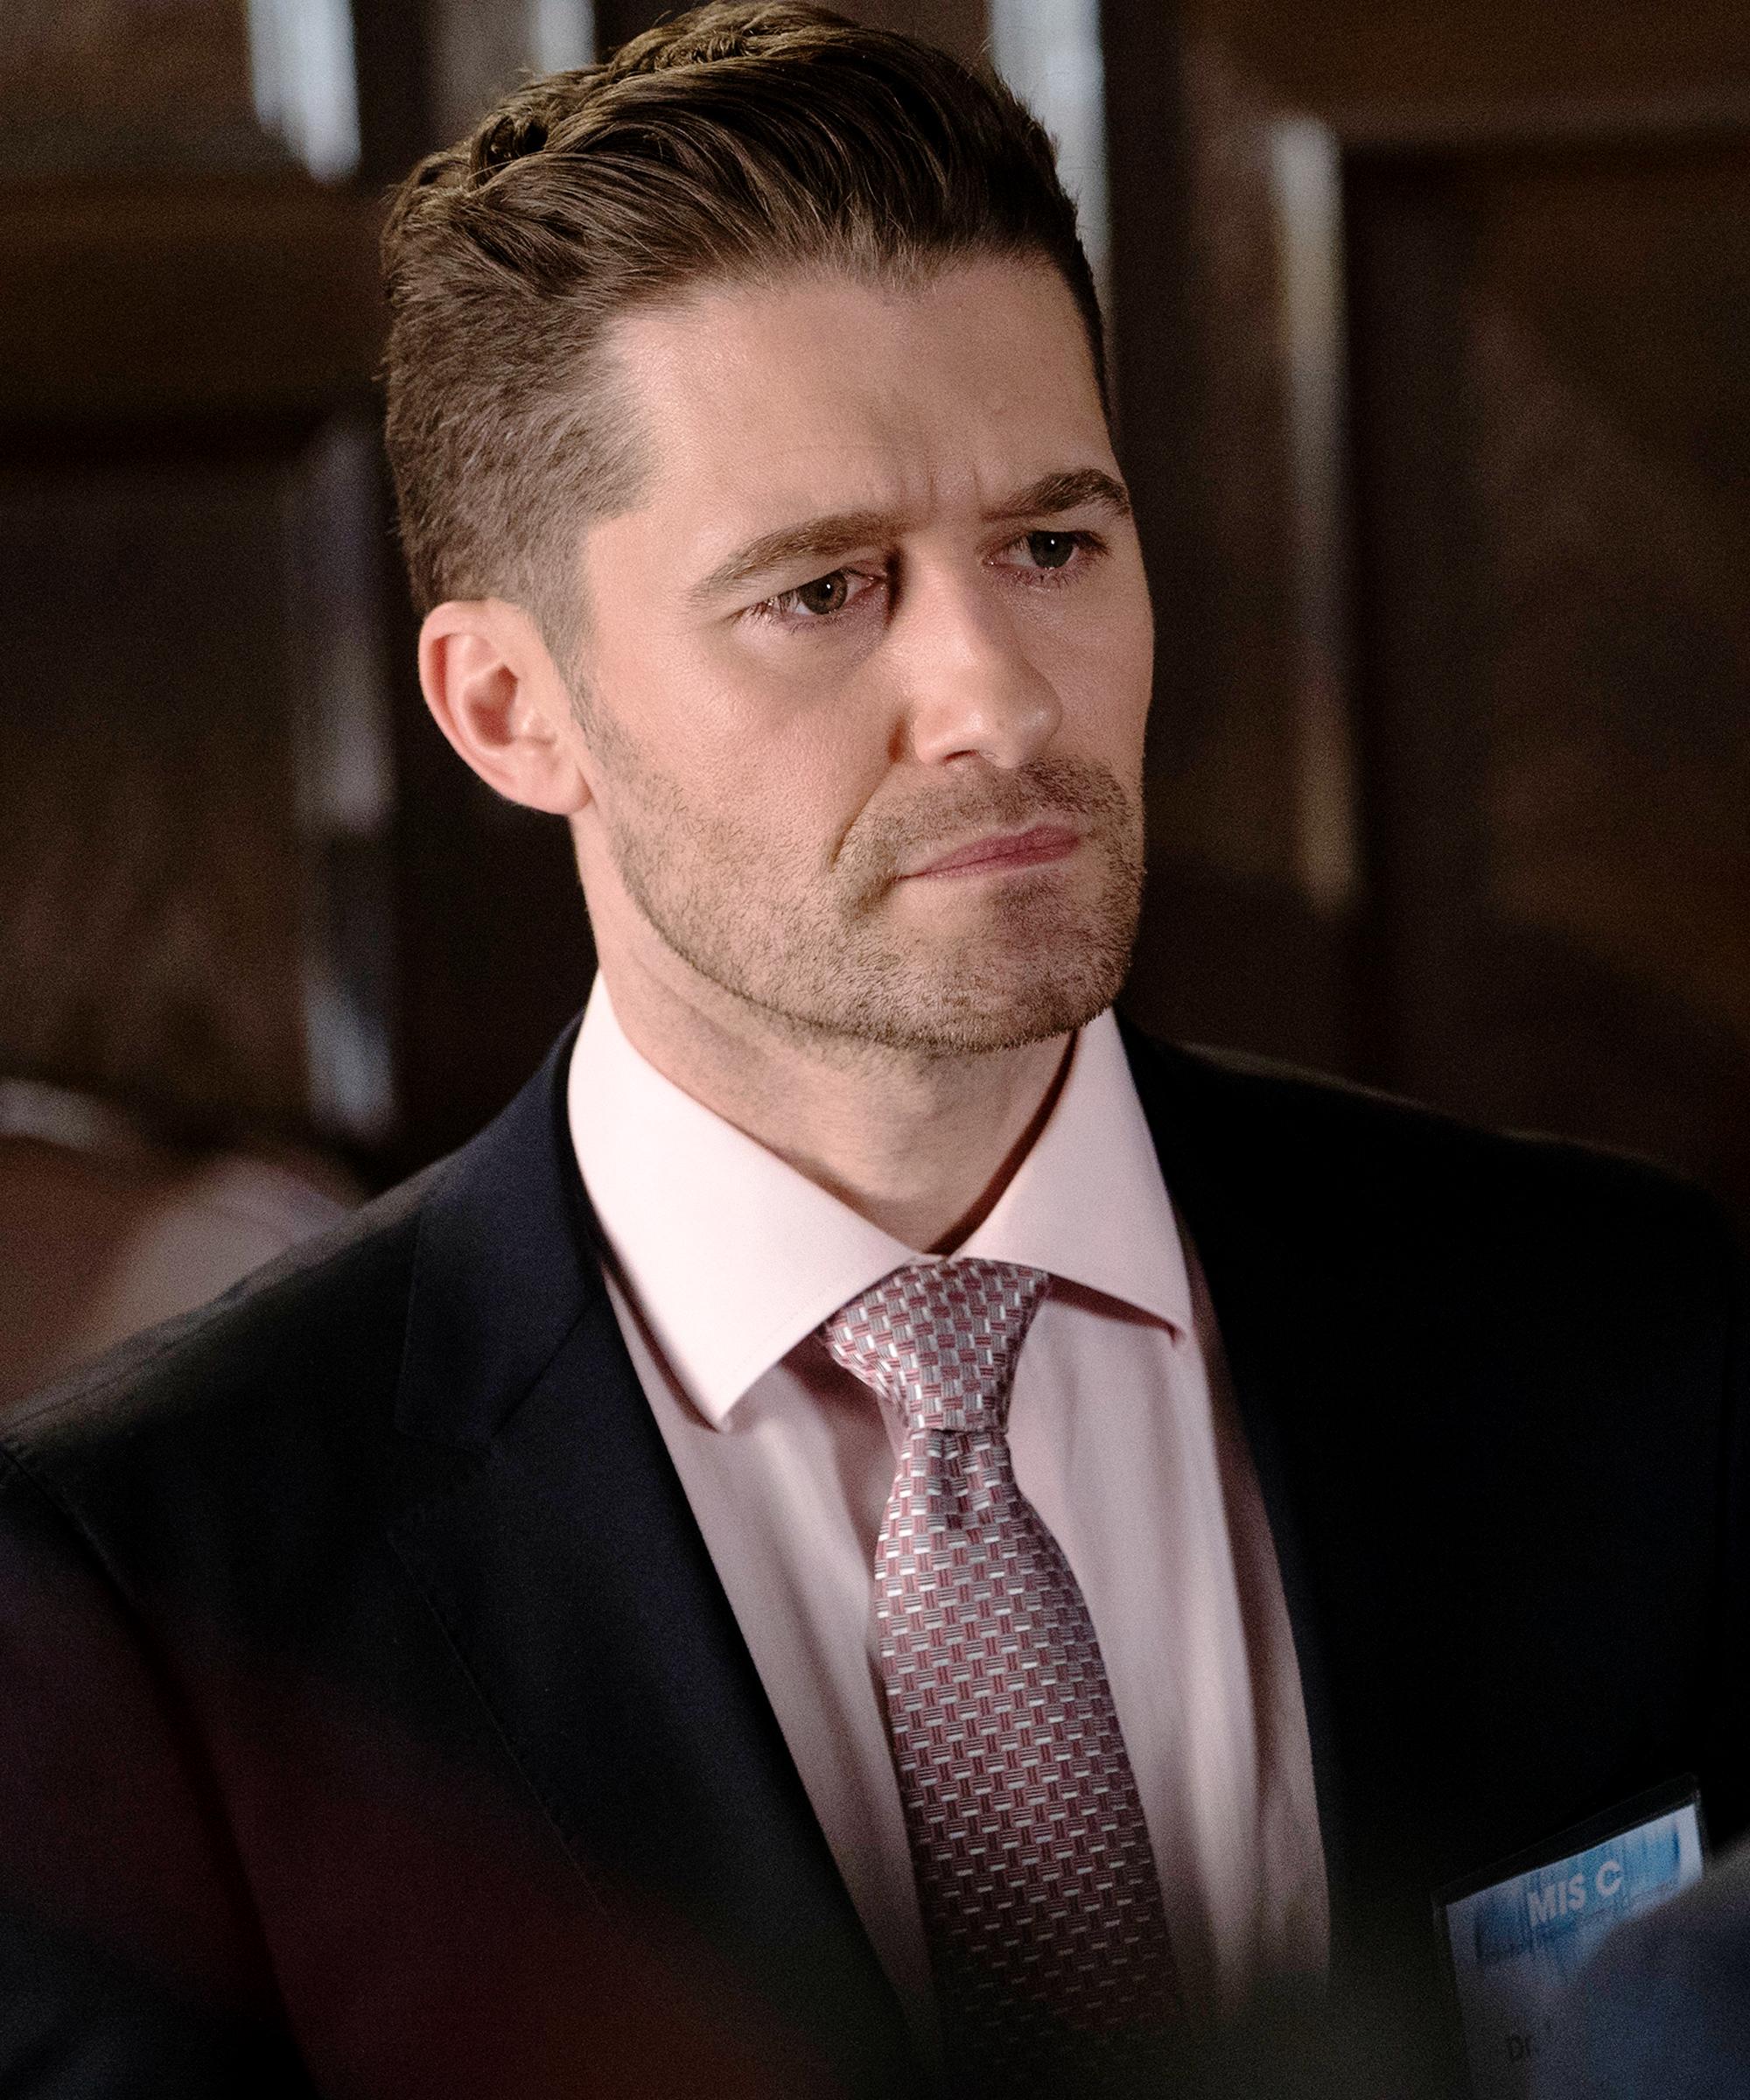 Greys Anatomy Season 14 Matthew Morrison Returns